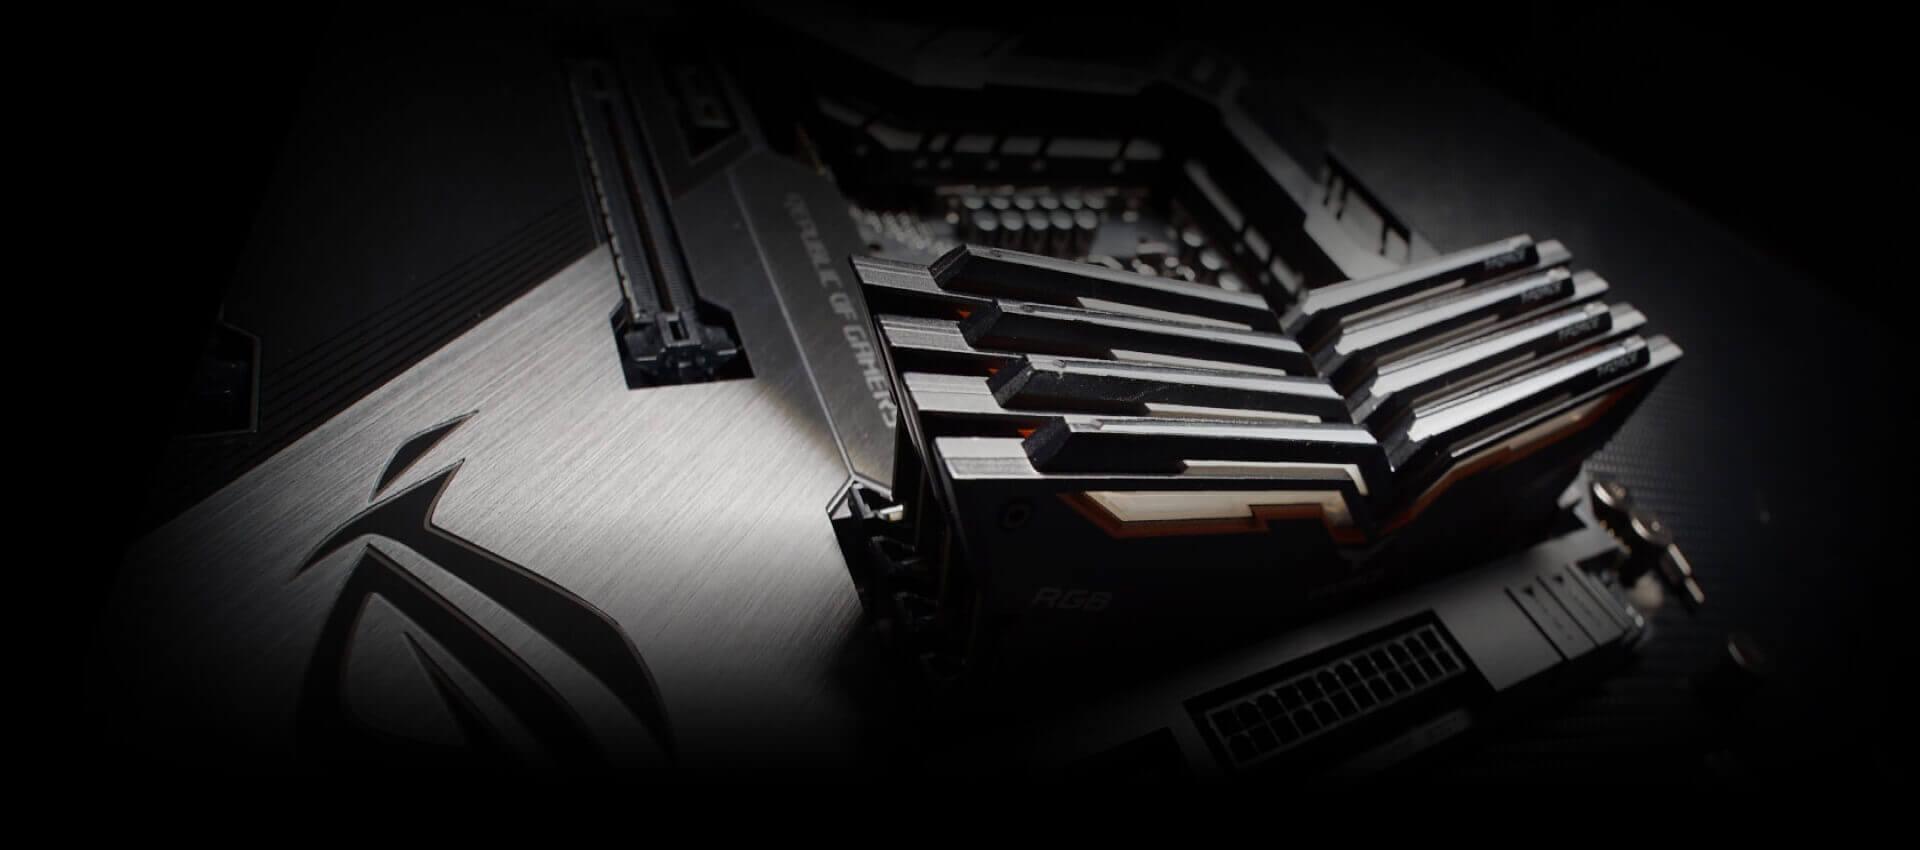 ASUS ROG MAXIMUS XI CODE   Gaming Motherboard   ASUS USA